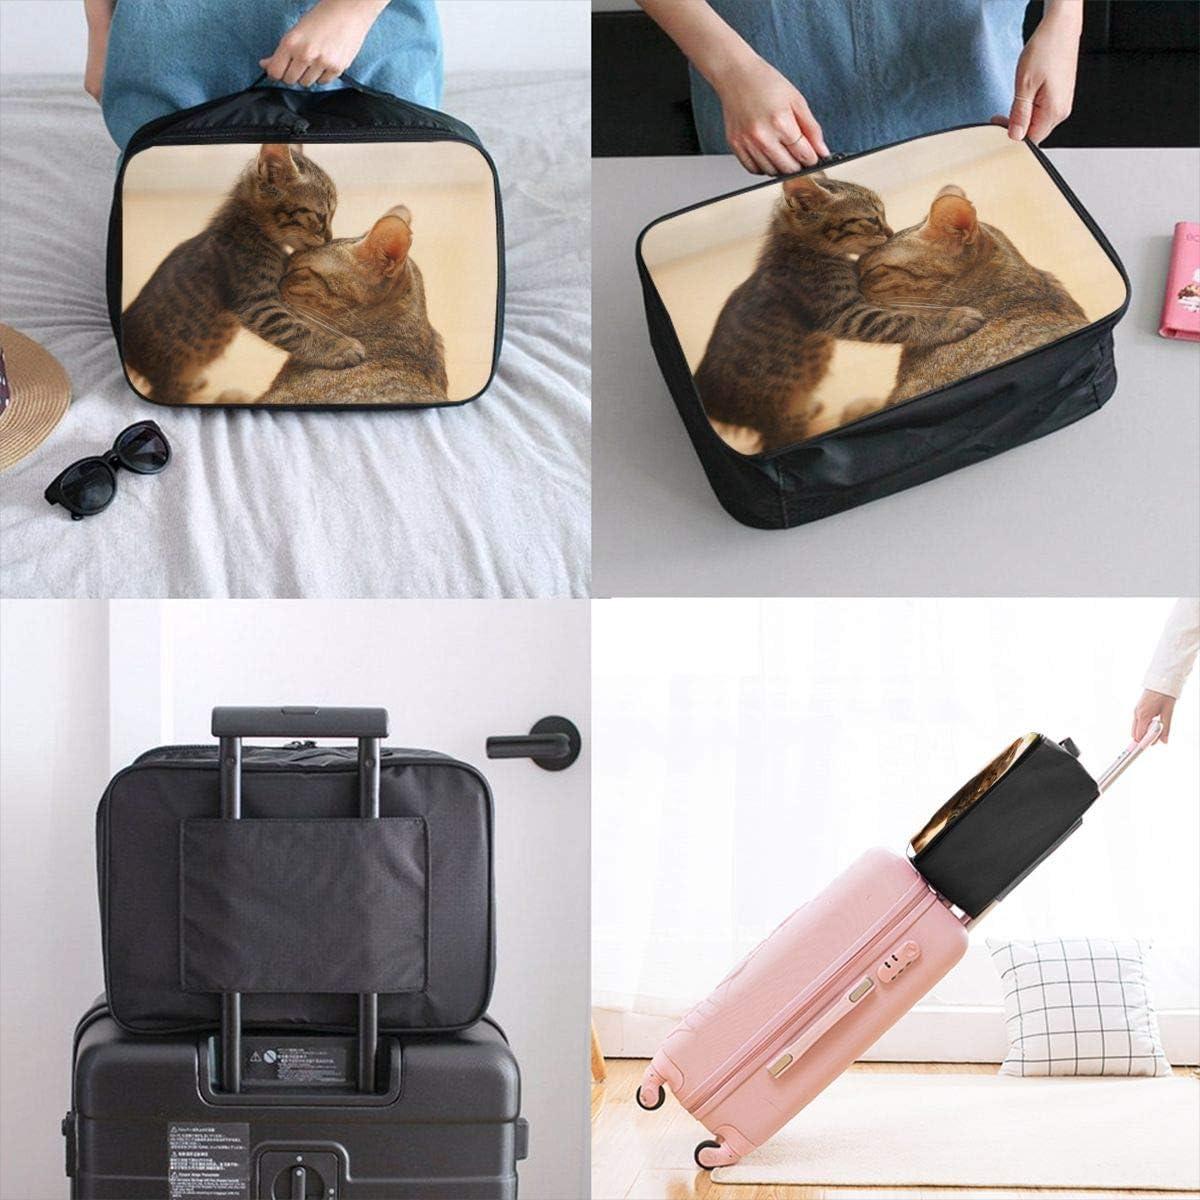 Yunshm Animal Cat Cute Kitten And Cat Mom Customized Trolley Handbag Waterproof Unisex Large Capacity For Business Travel Storage